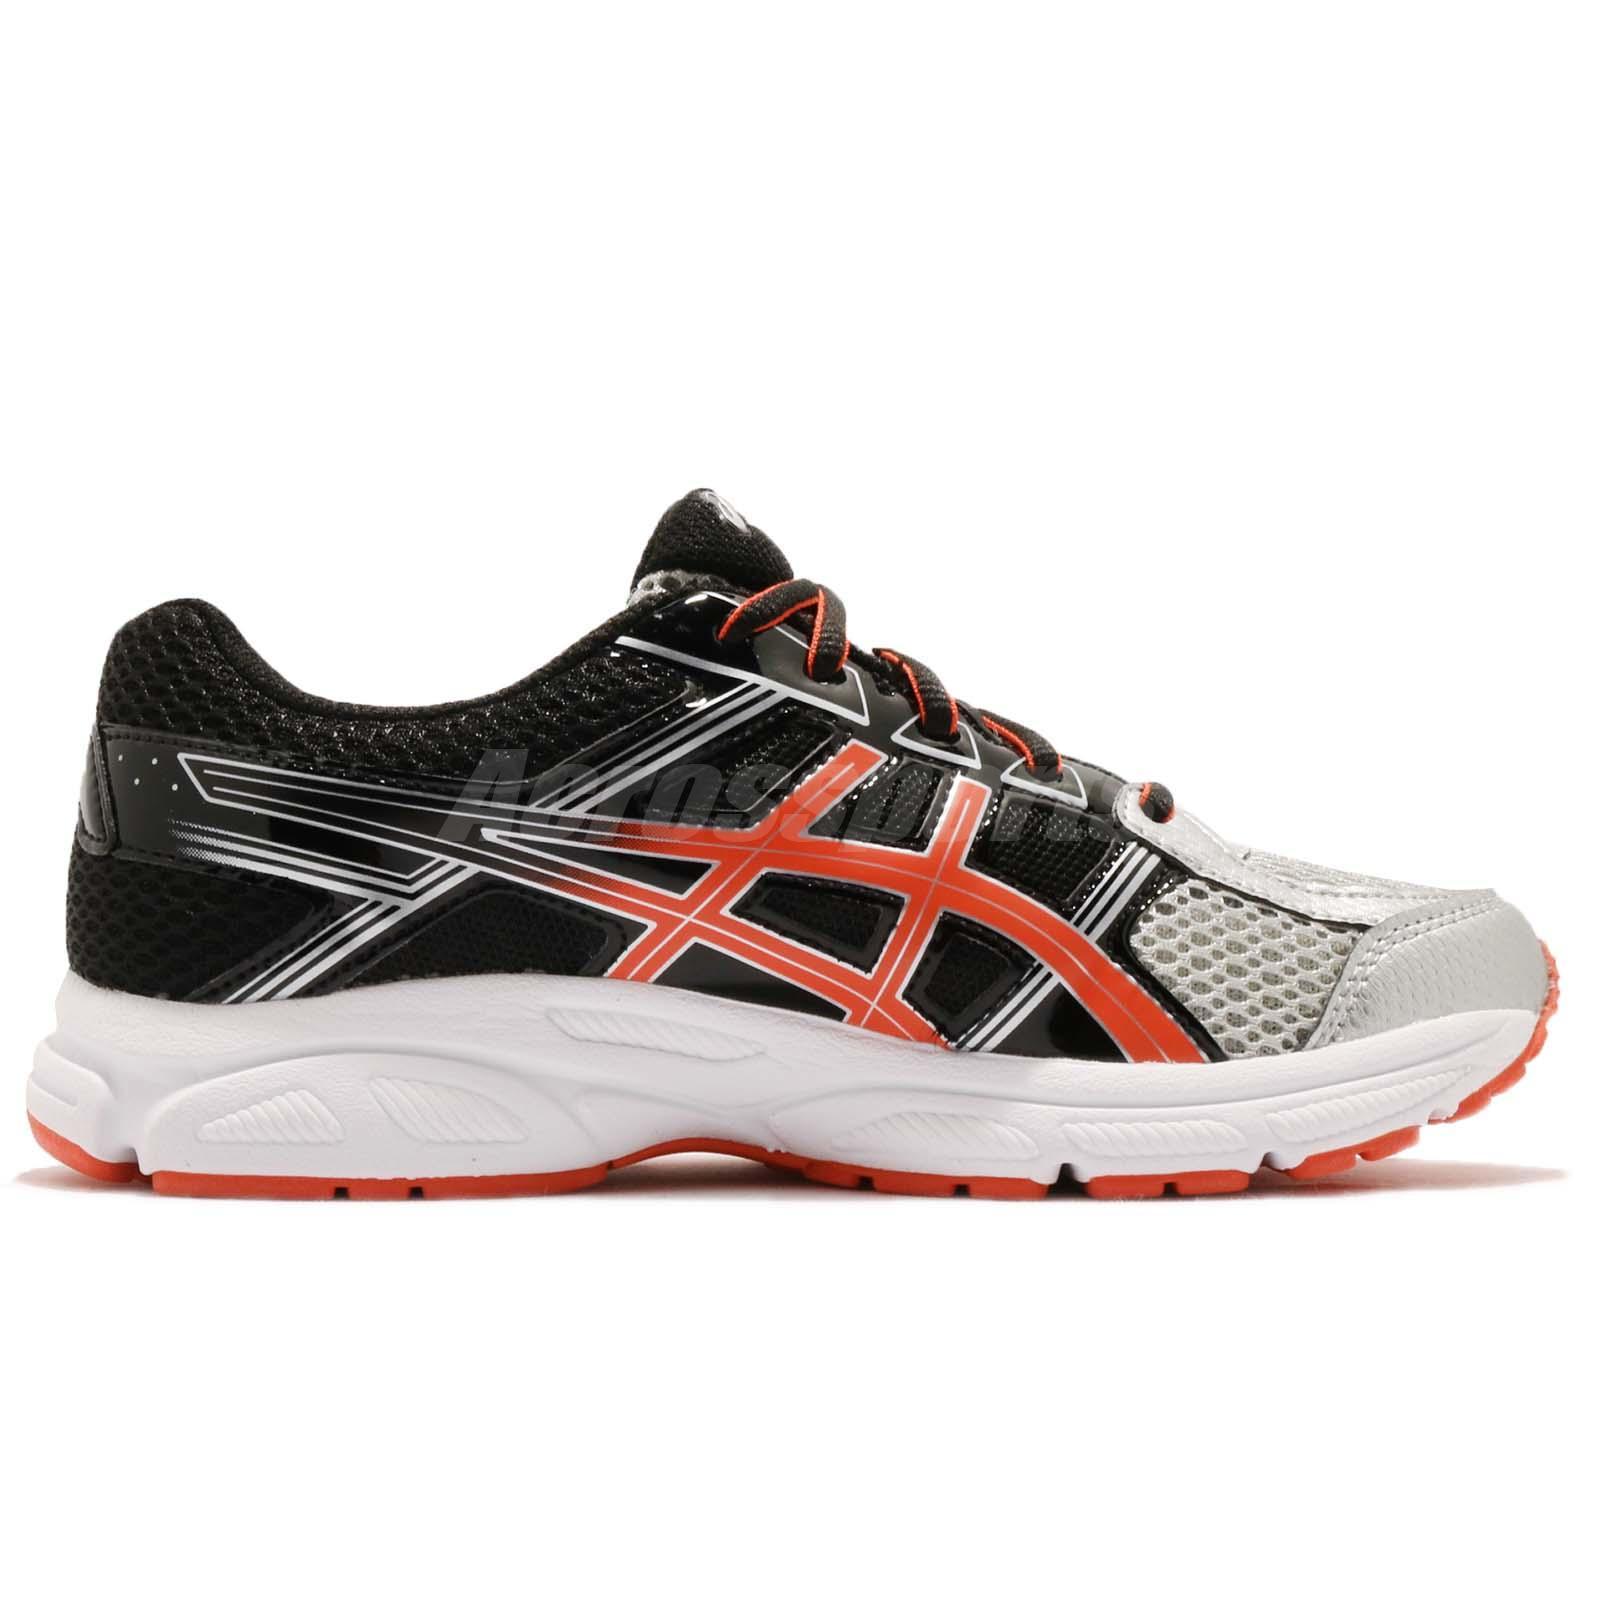 asics junior running shoes size 4 black